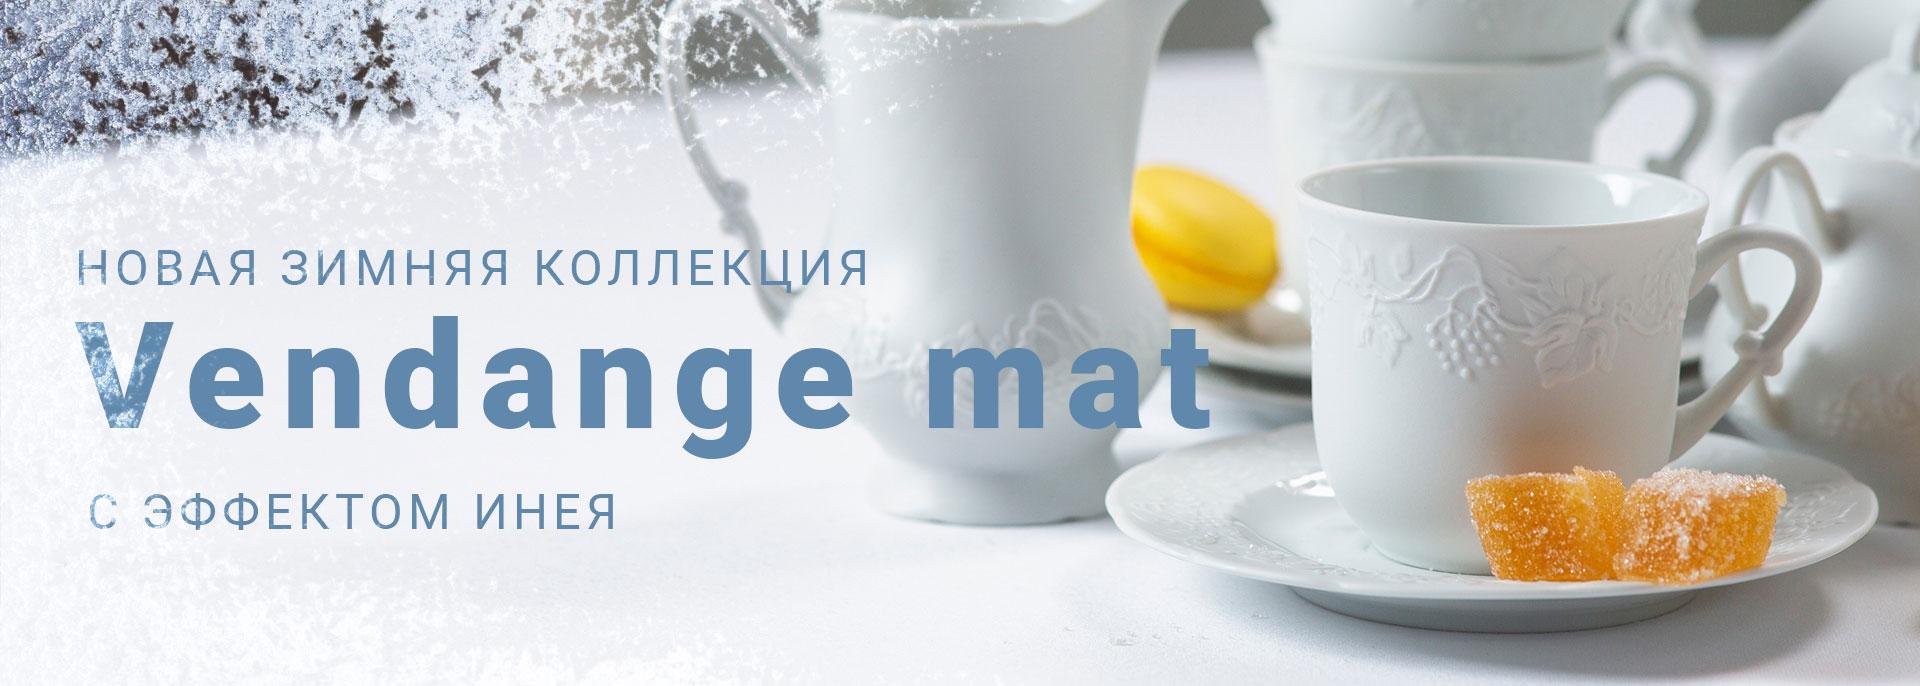 vendange_mat